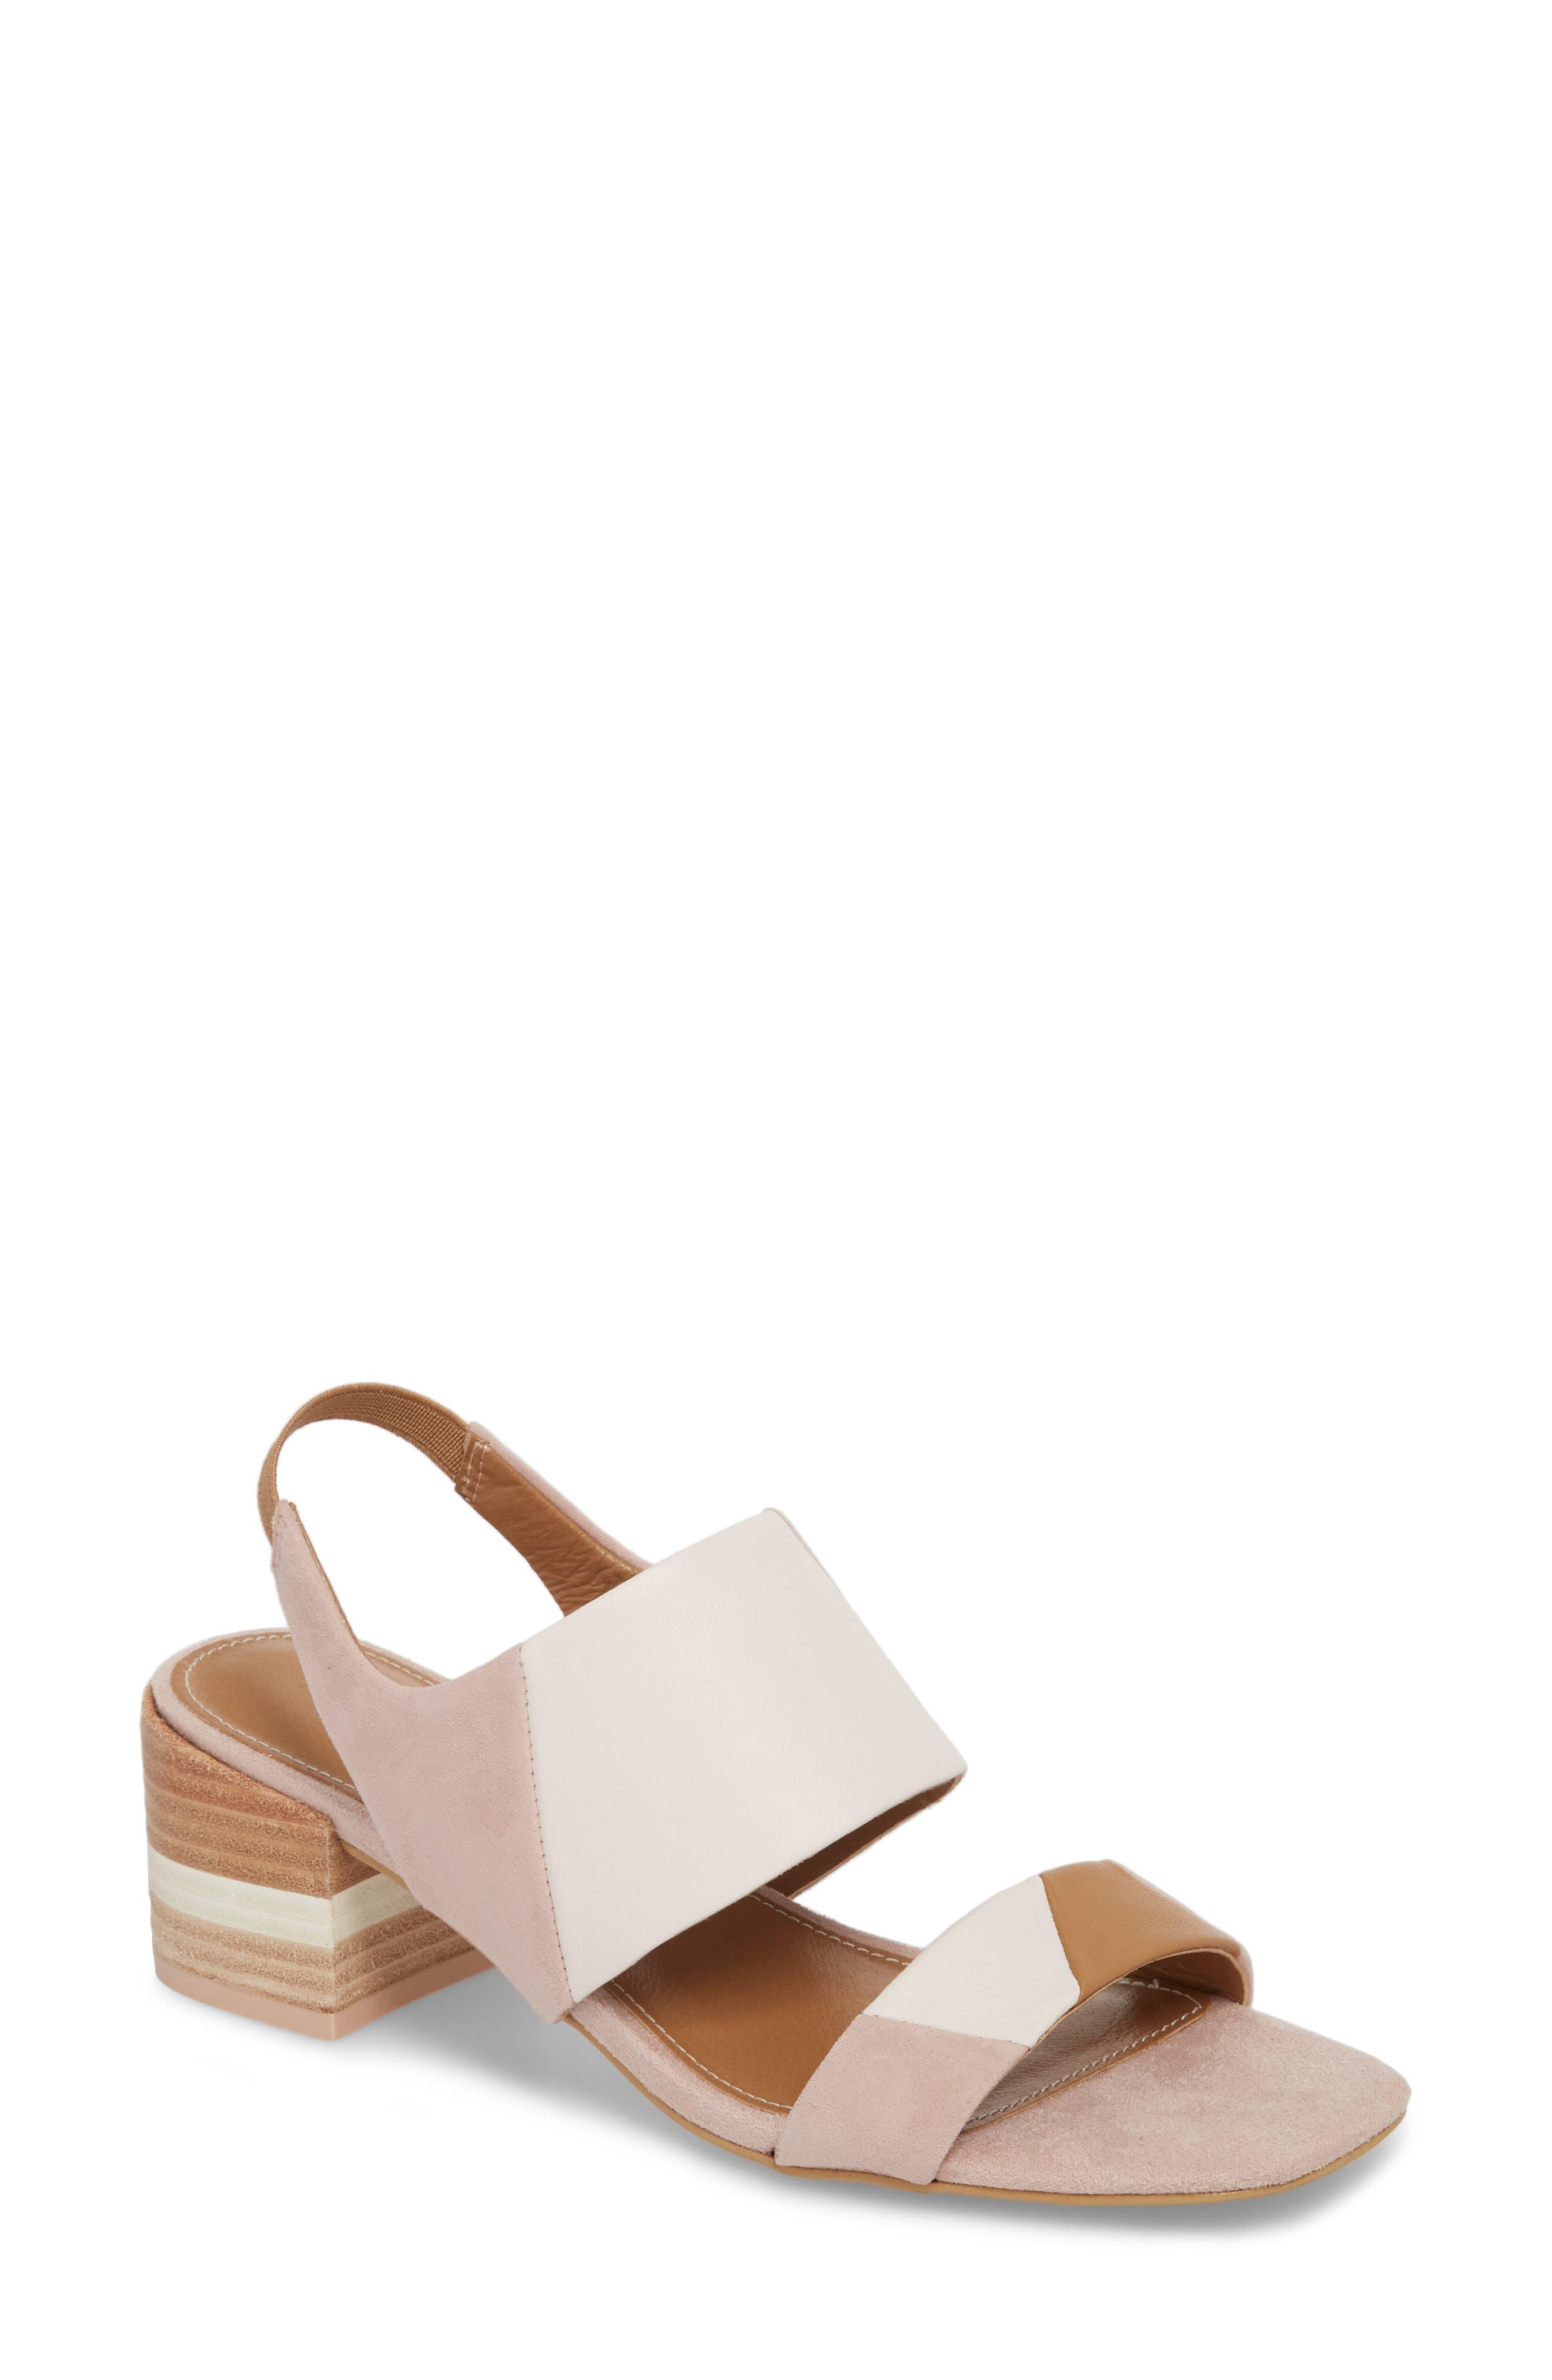 Kelsi Dagger Brooklyn Shiloh Block Heel Sandal (Women)